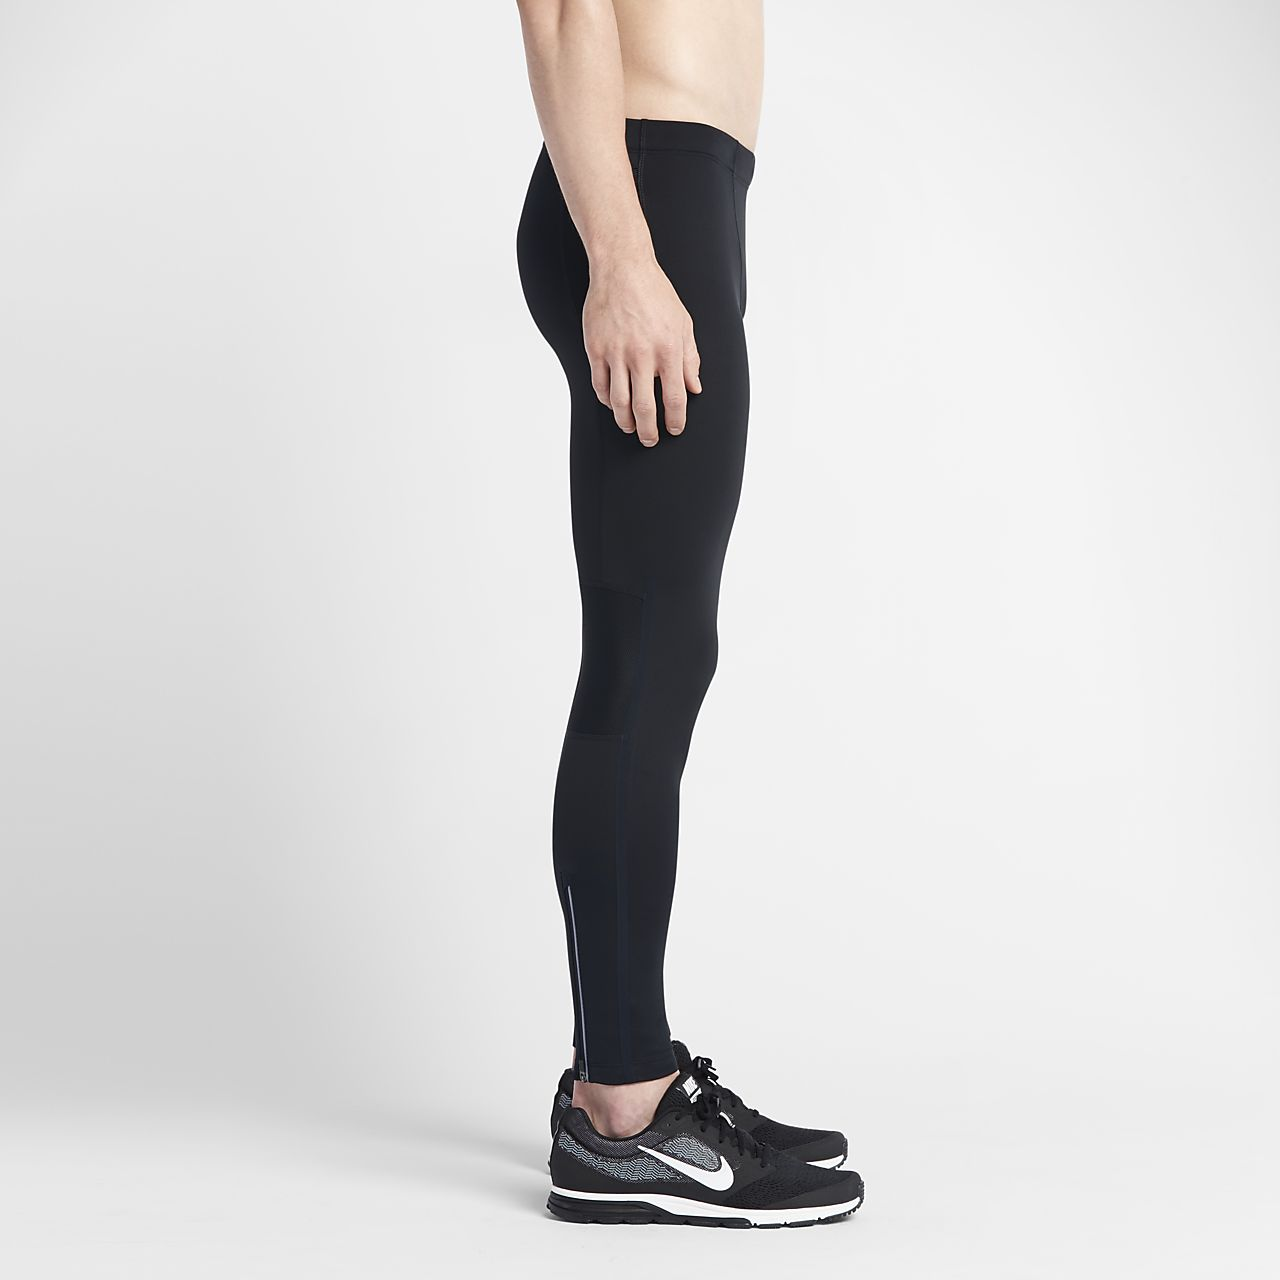 bfd545f3ae1 Nike Power Tech Men's Running Tights. Nike.com GB